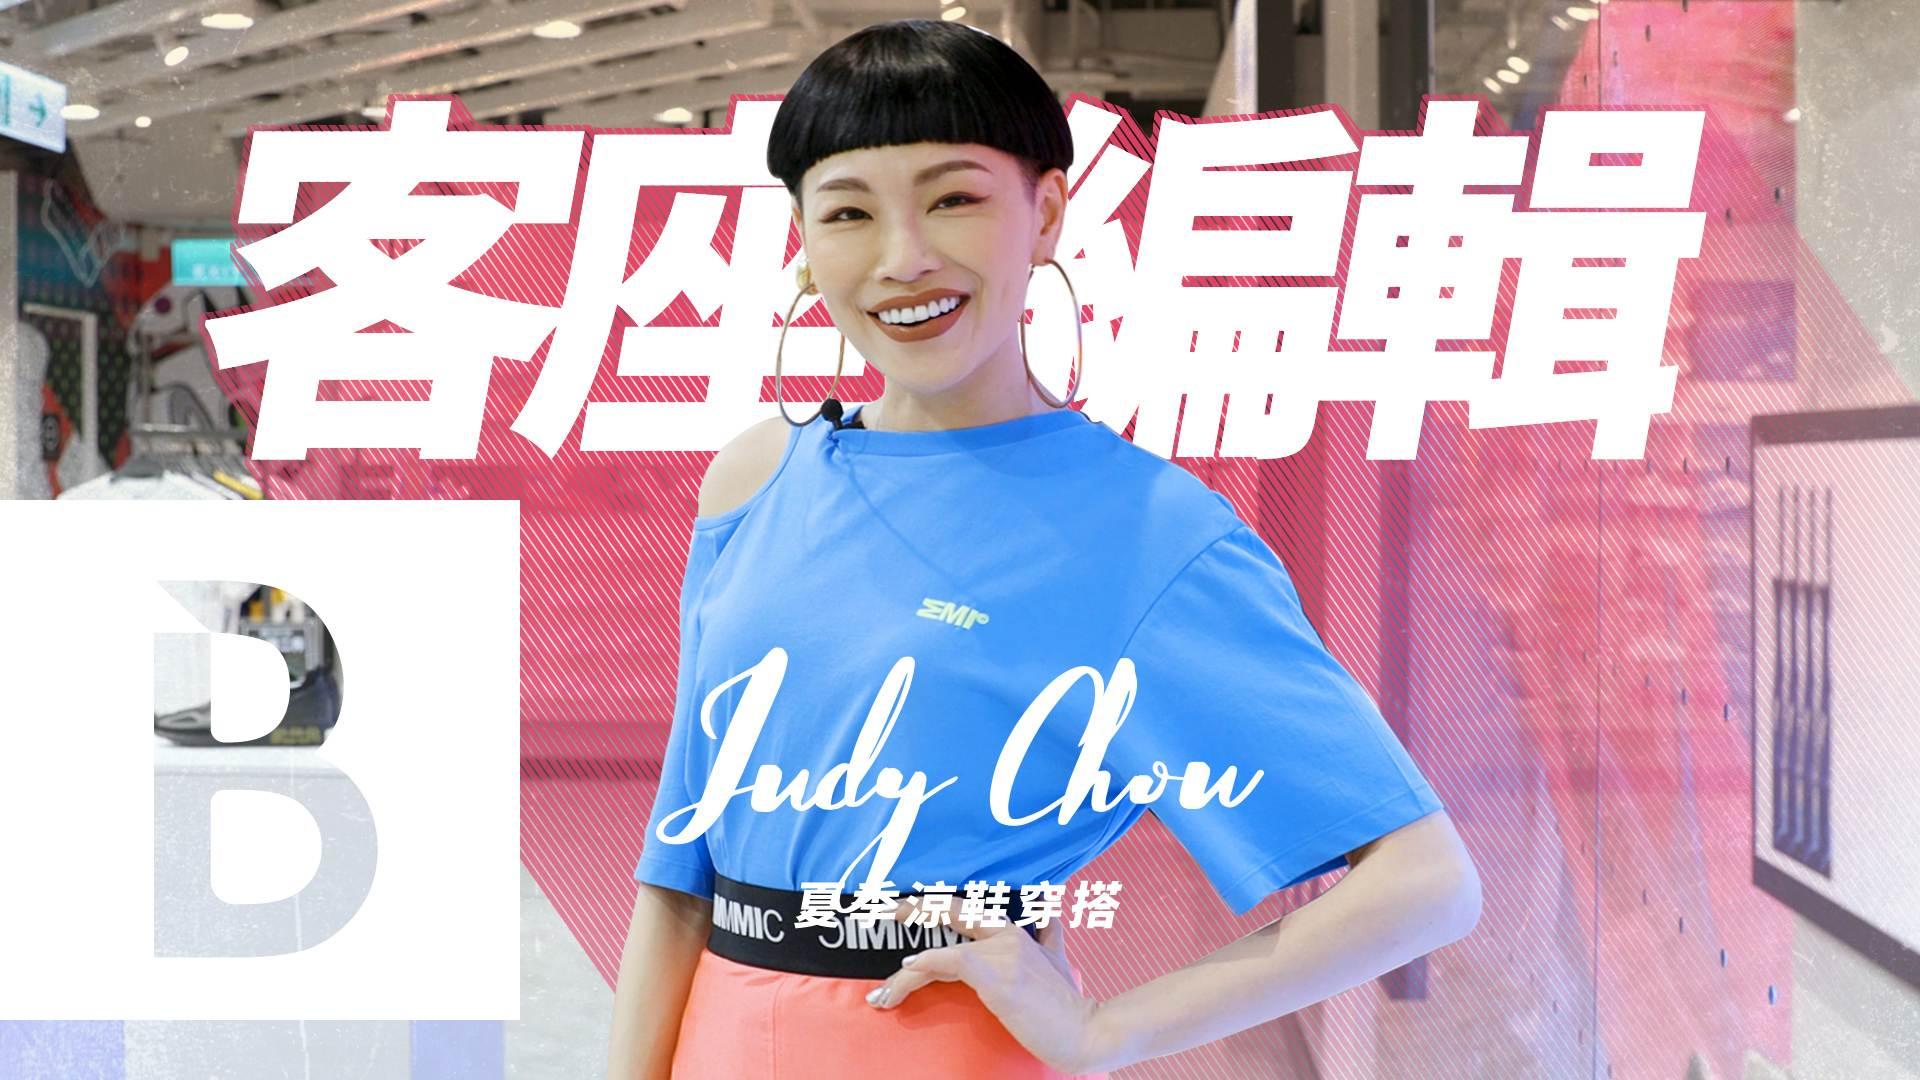 【Bella Ju 一下】2020必收涼鞋款有哪些?知名造型師Judy傳授涼鞋穿搭技巧,其中「這幾雙」最百搭!│ Bella Taiwan